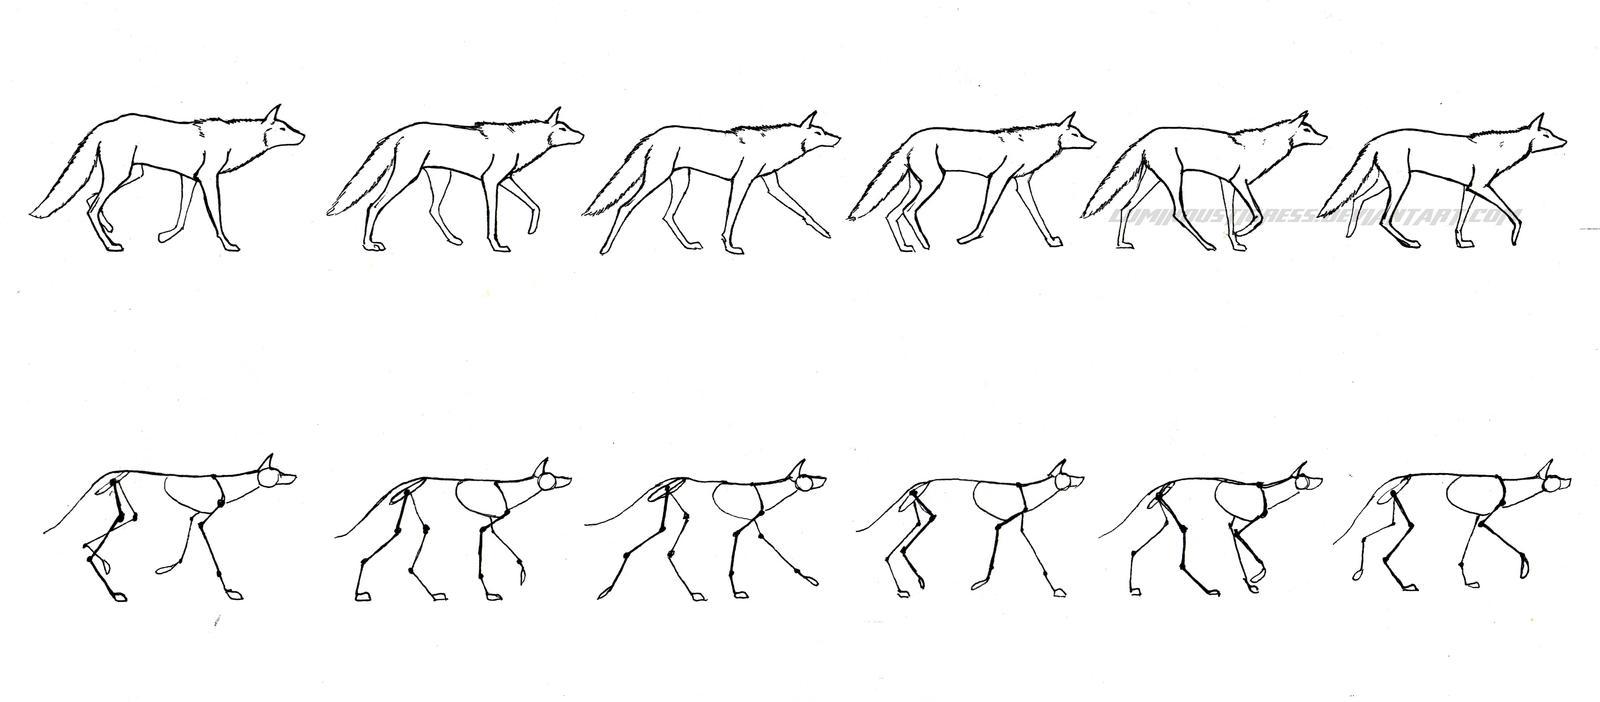 Wolf walking cycle by Axxirah on DeviantArt